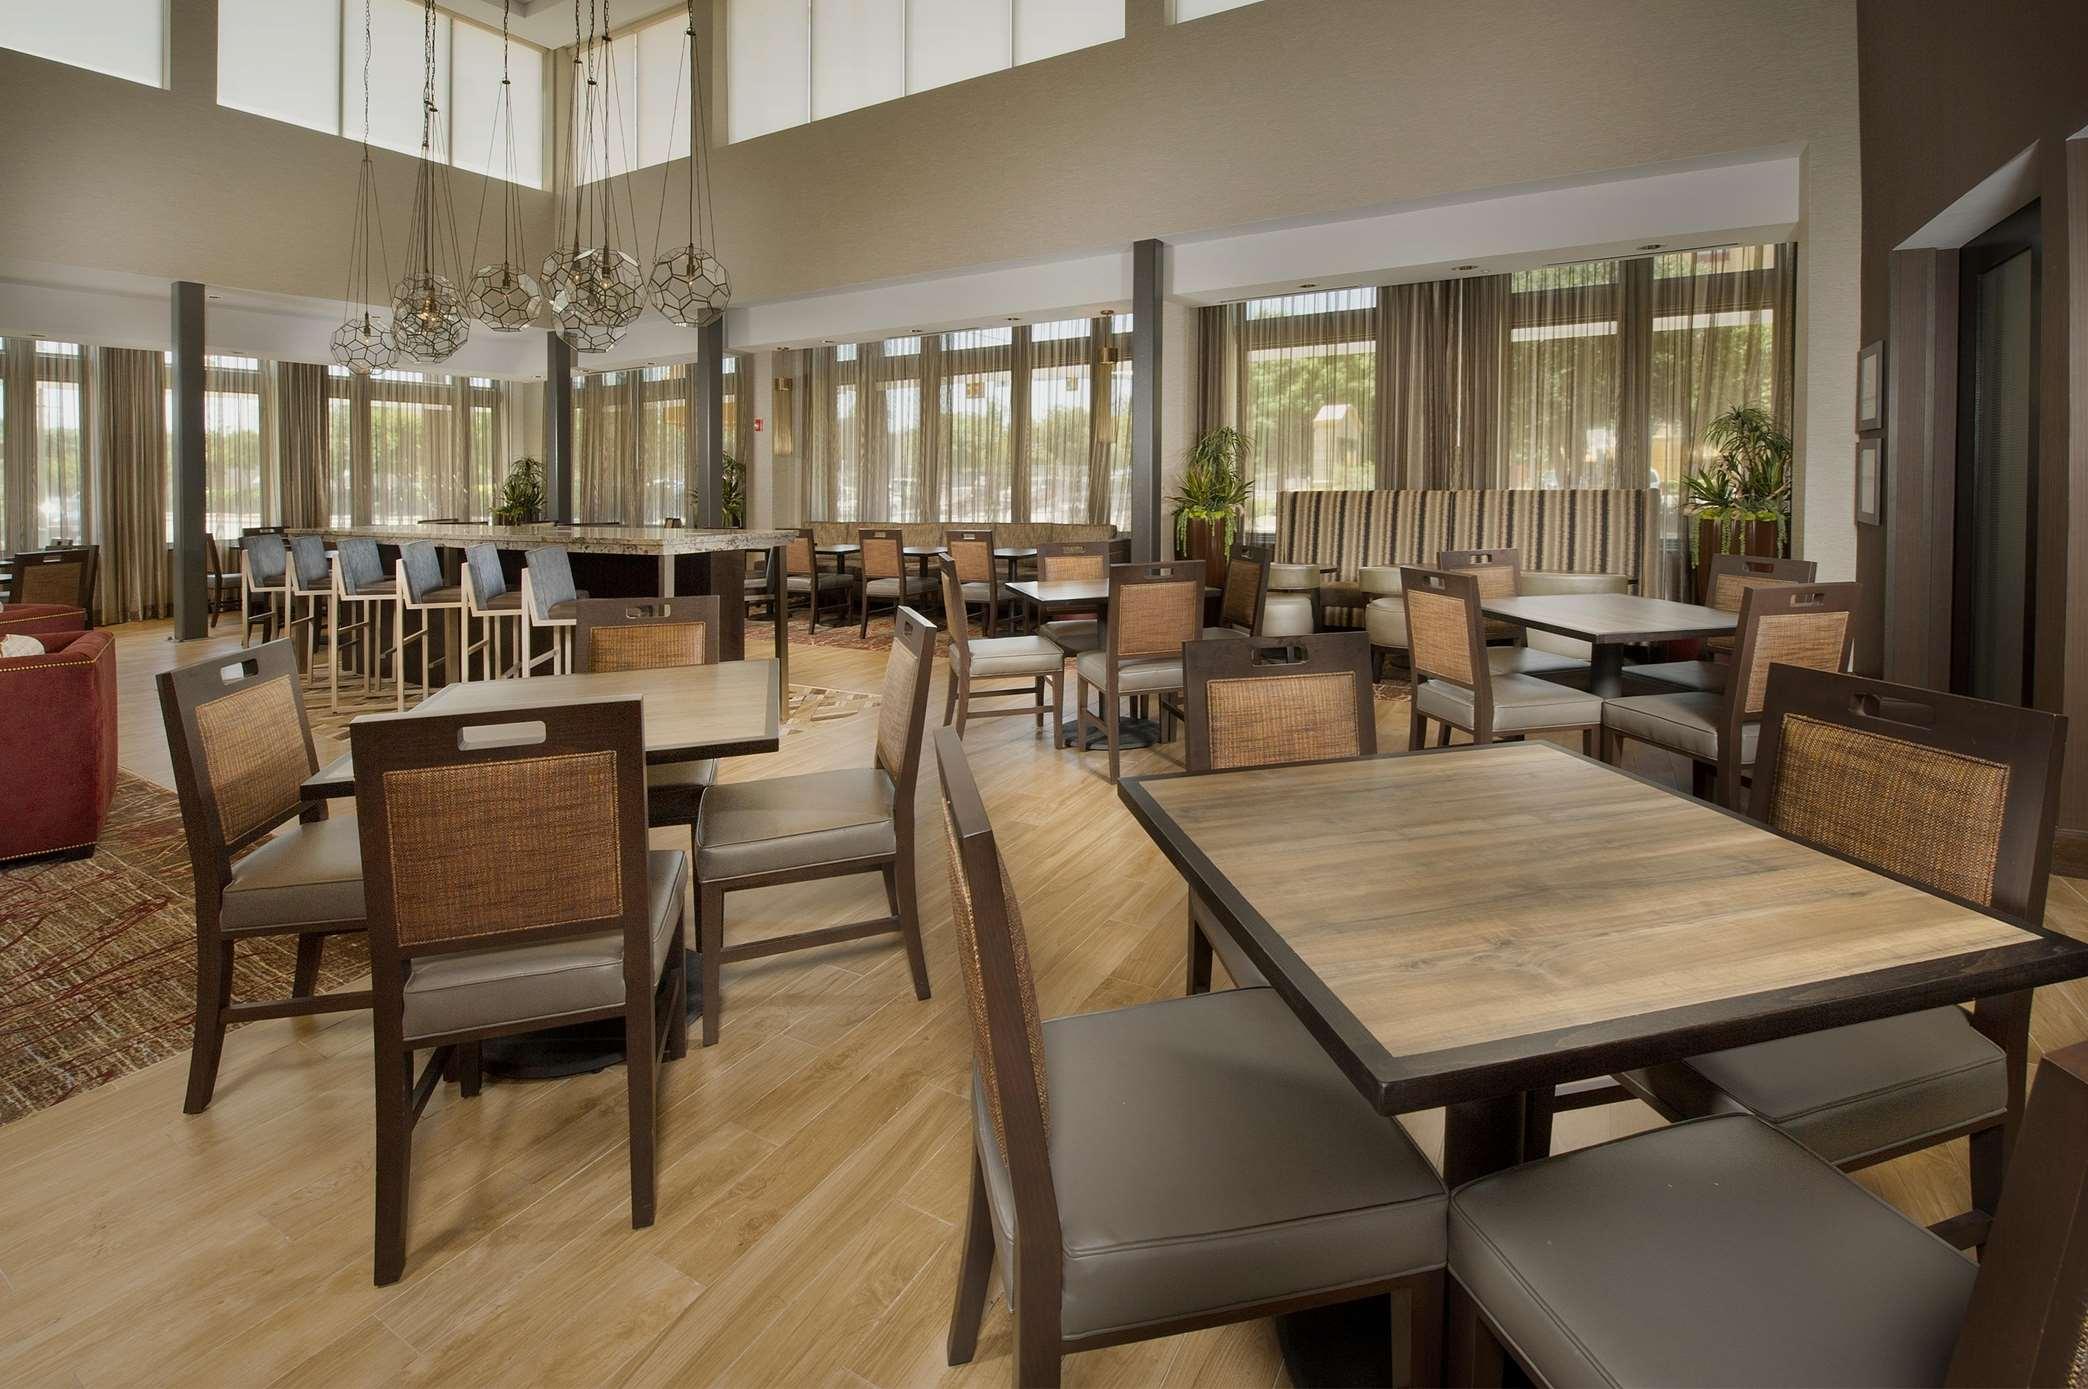 Hampton Inn & Suites San Antonio-Downtown/Market Square image 6